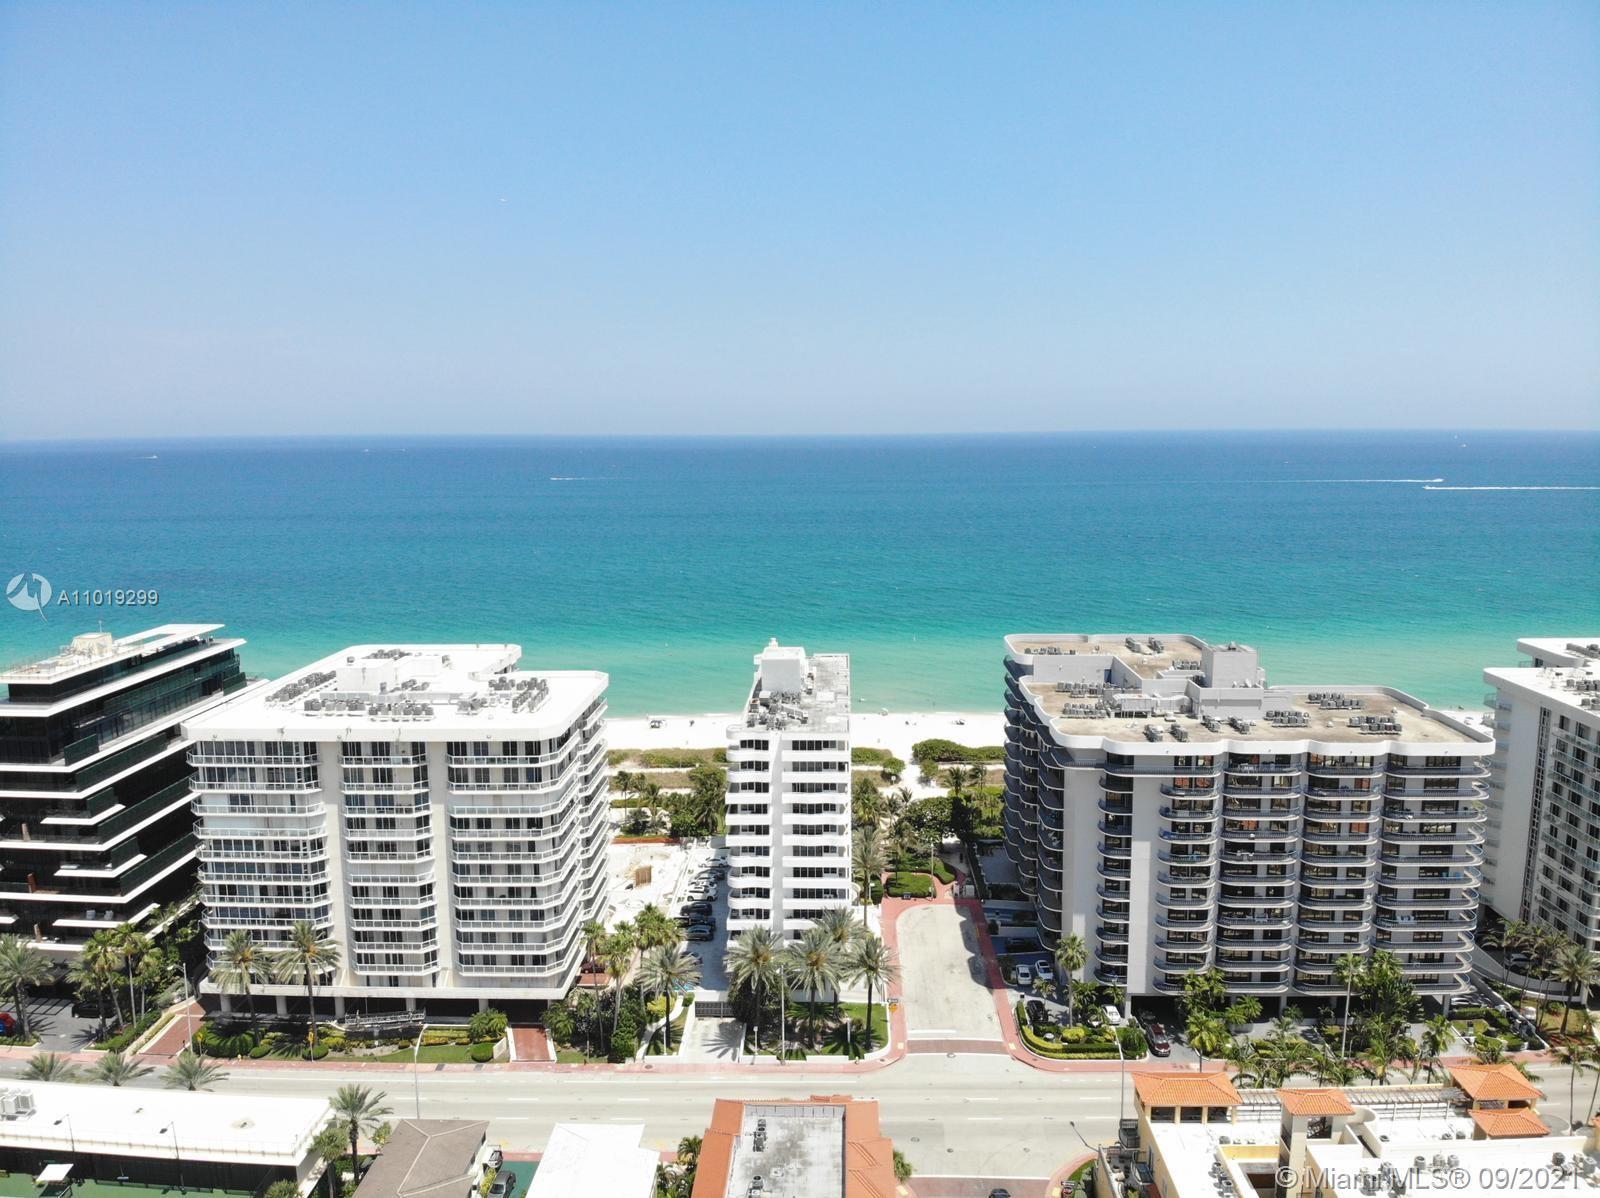 8911 Collins Ave Unit 402, Surfside, Florida 33154